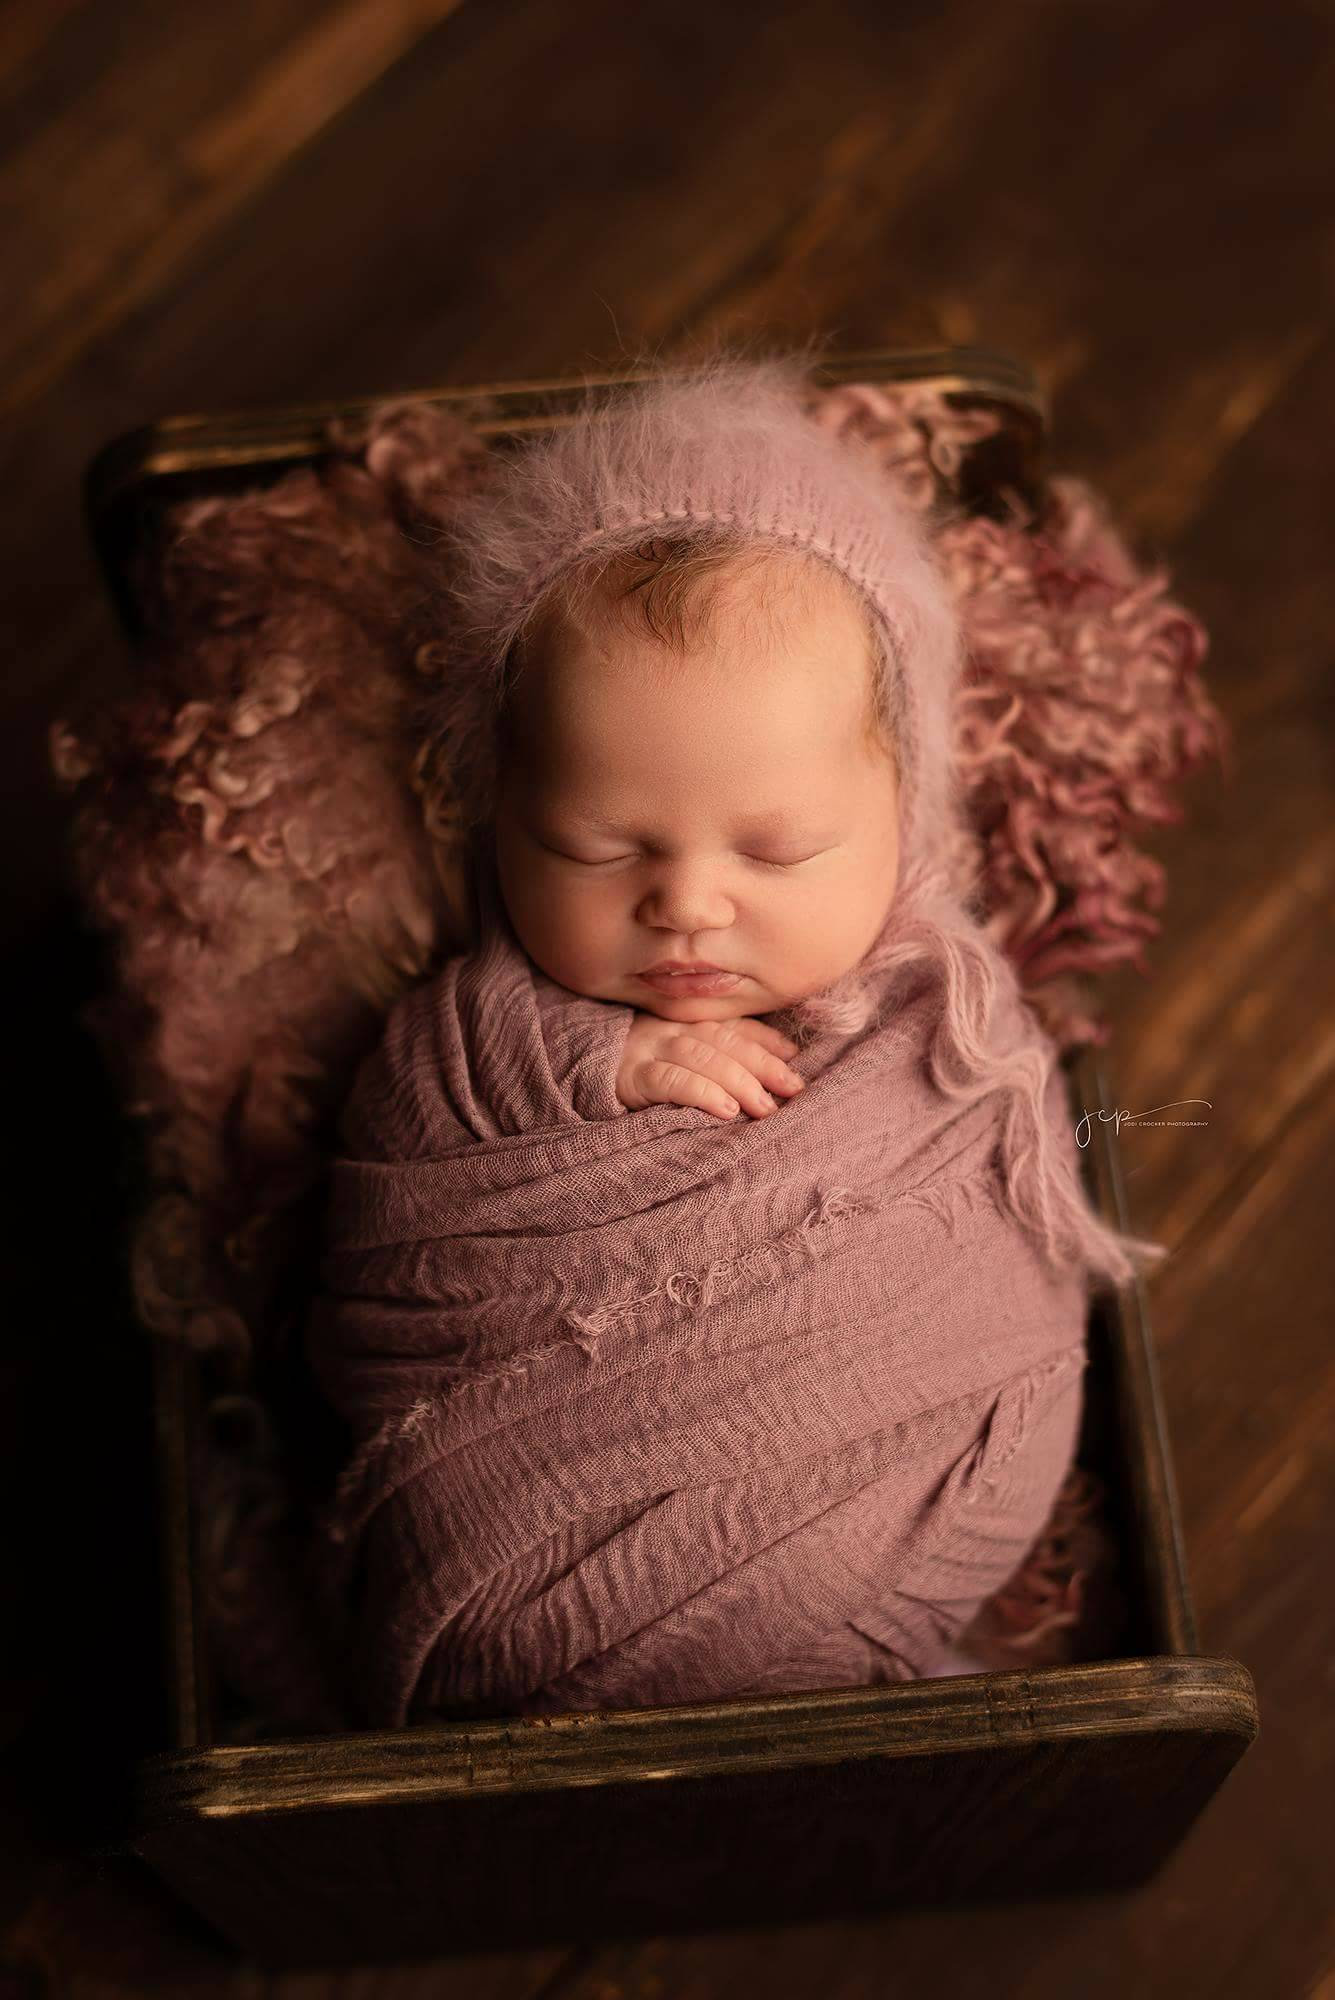 Cotton Swaddle Fold Newborn Wraps,Neutral Tassels Wrap,Newborn Basket Stuffer,Newborn Layering Fabric,Baby Photo Prop Wrap